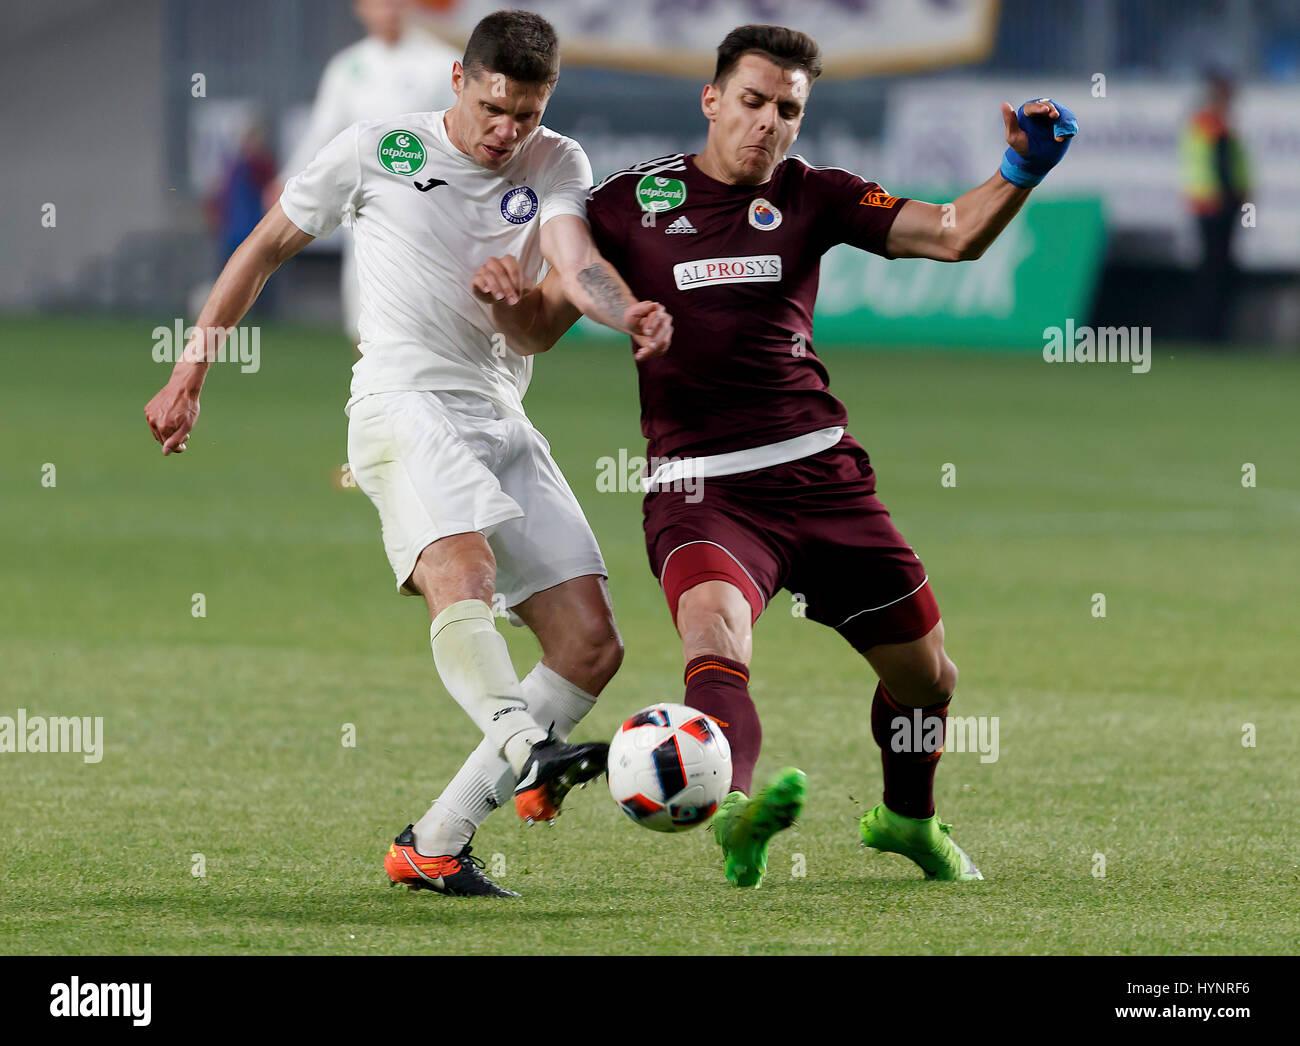 Budapest Hungary 05th Apr 2017 Balint Gaal R of Vasas FC